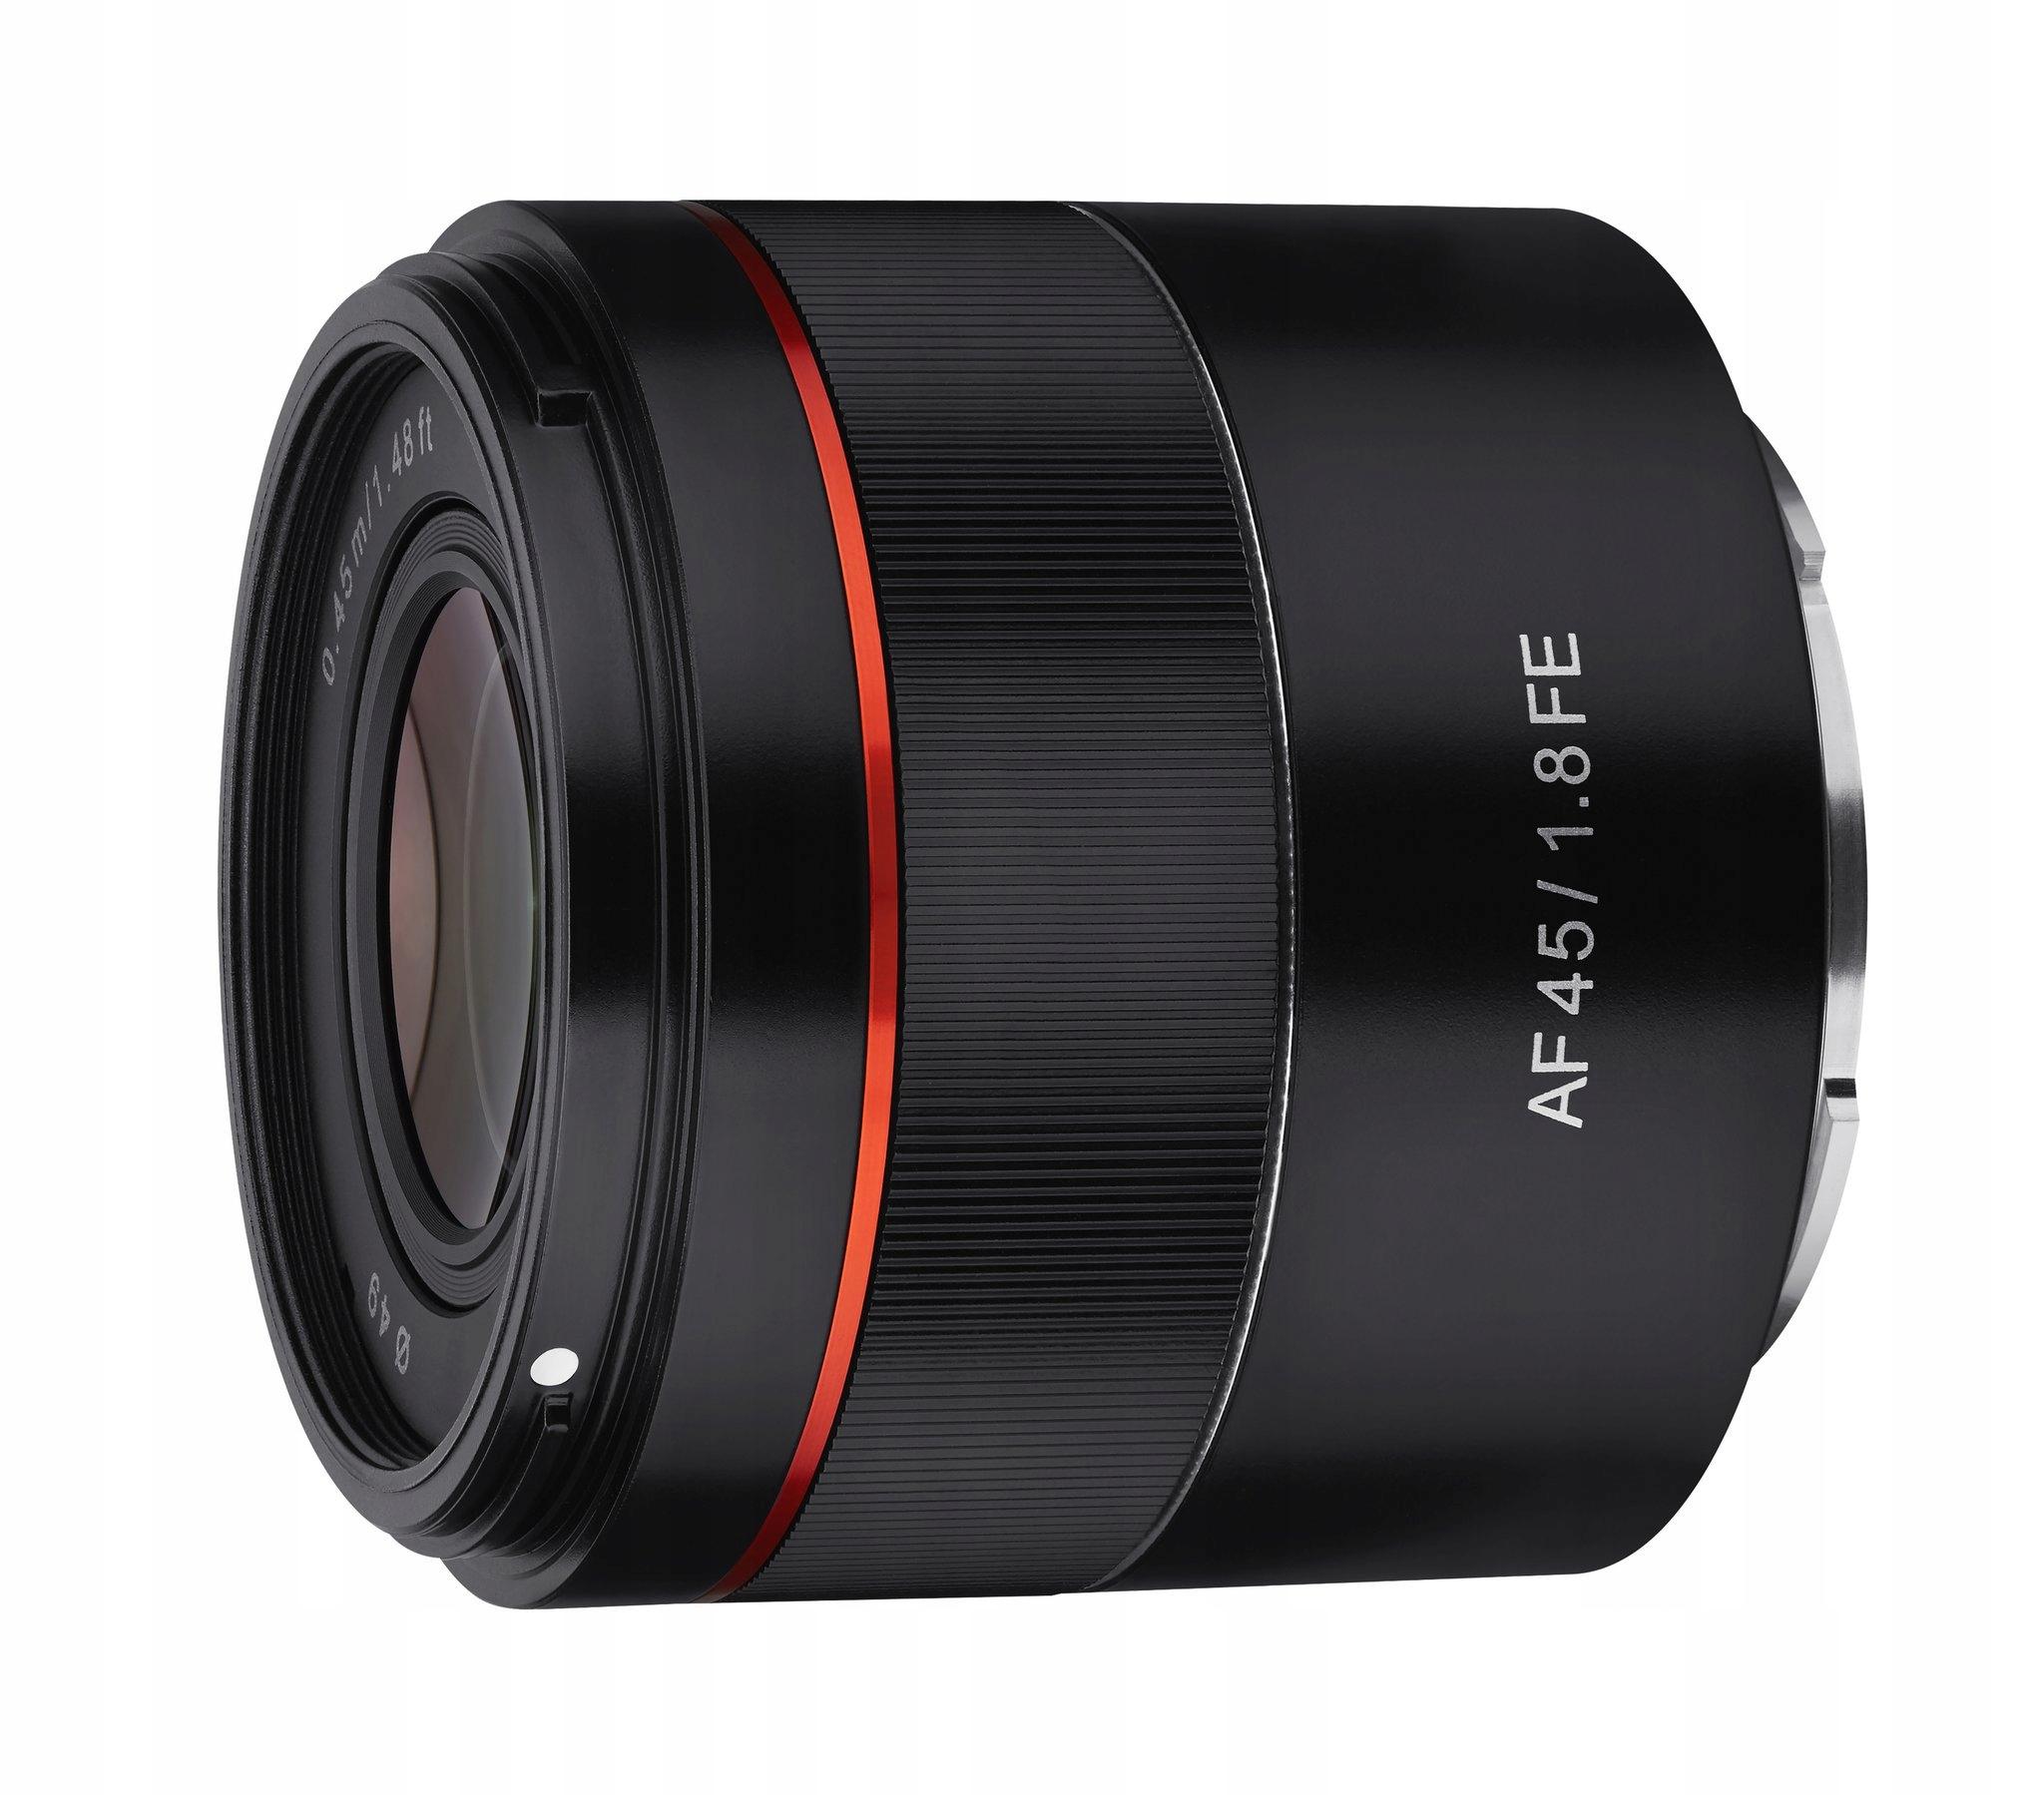 Item The company samyang AF 45mm F1.8 FE Sony E-mount FOTORIMEX